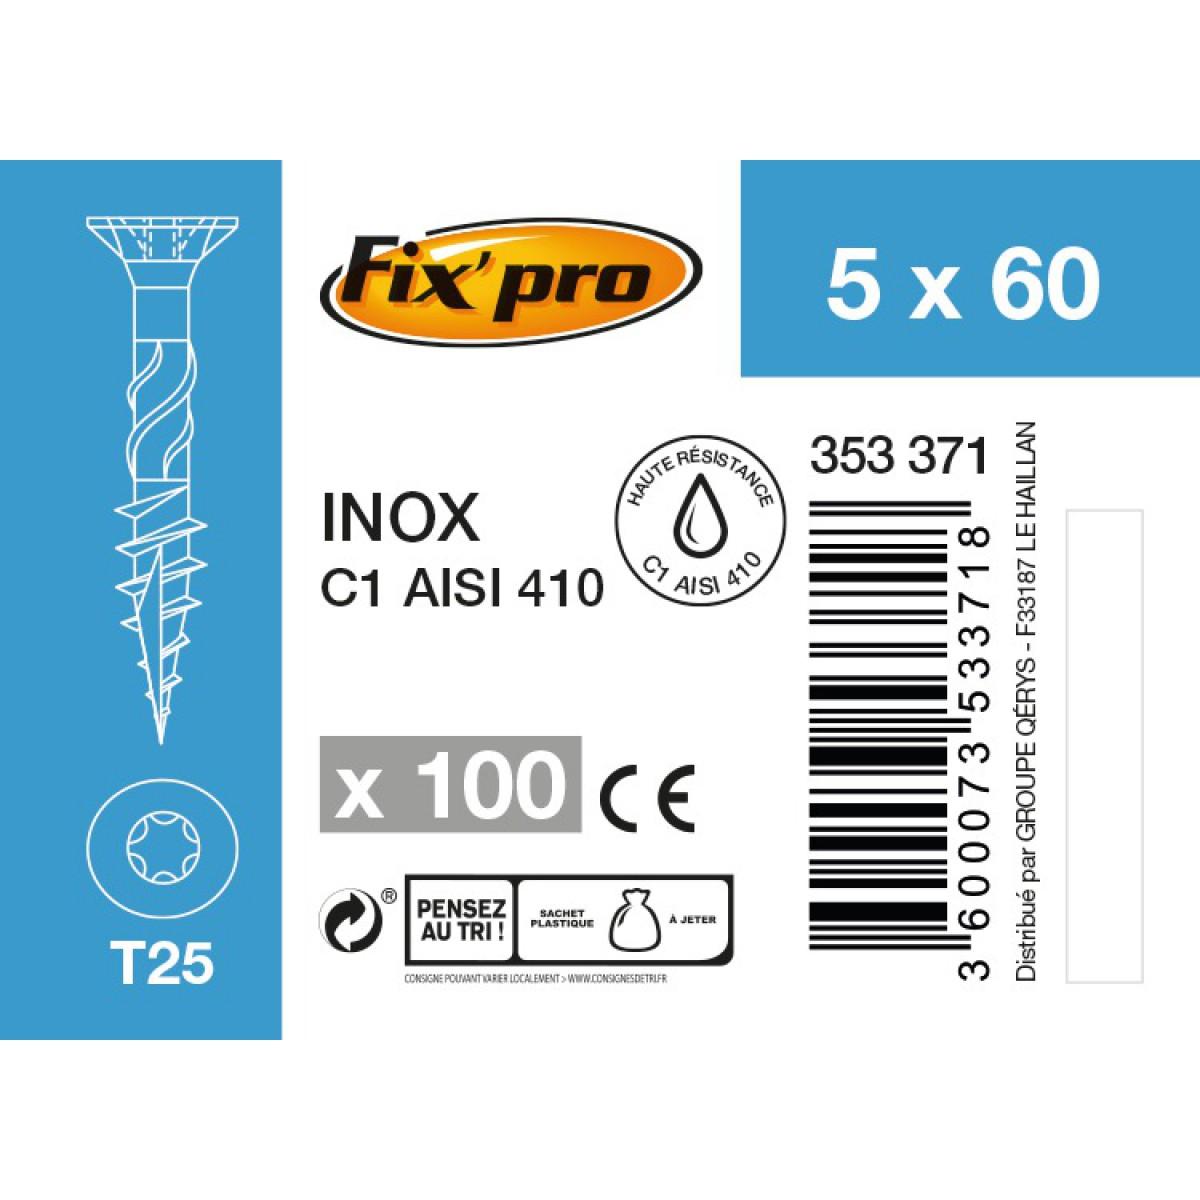 Vis terrasse inox C1 - 5x60 - 100pces - Fixpro